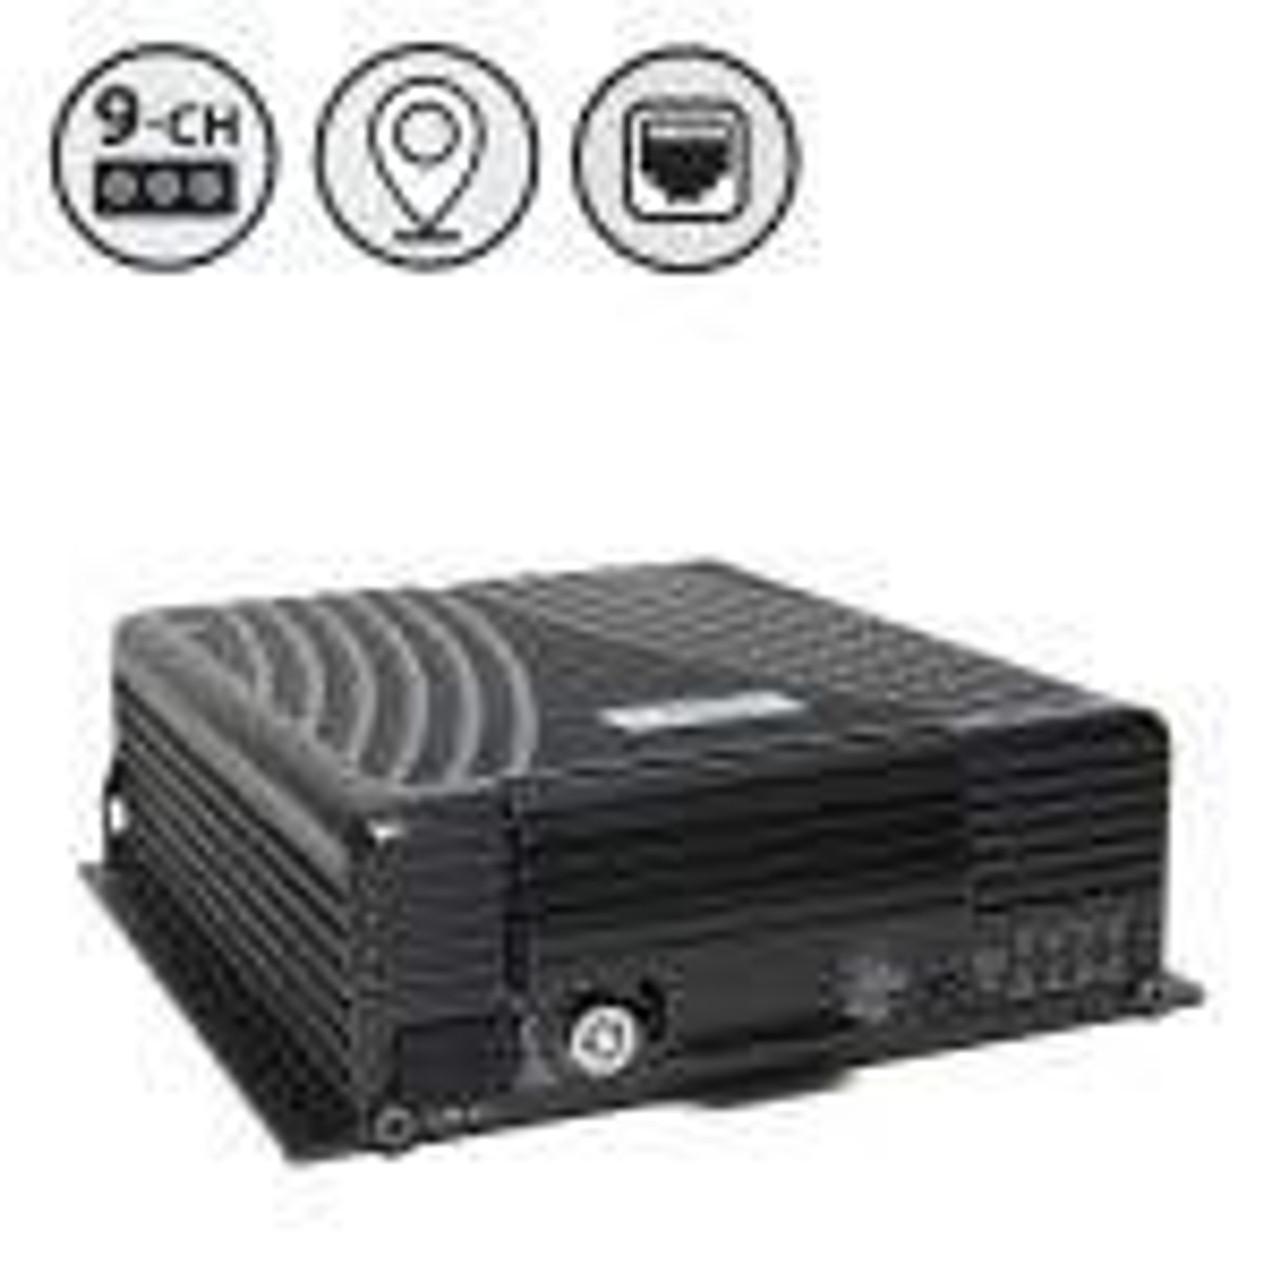 MobileMule™ 8150 | 9 Channel Mobile DVR with Built-in GPS, Western Digital Hard Drive